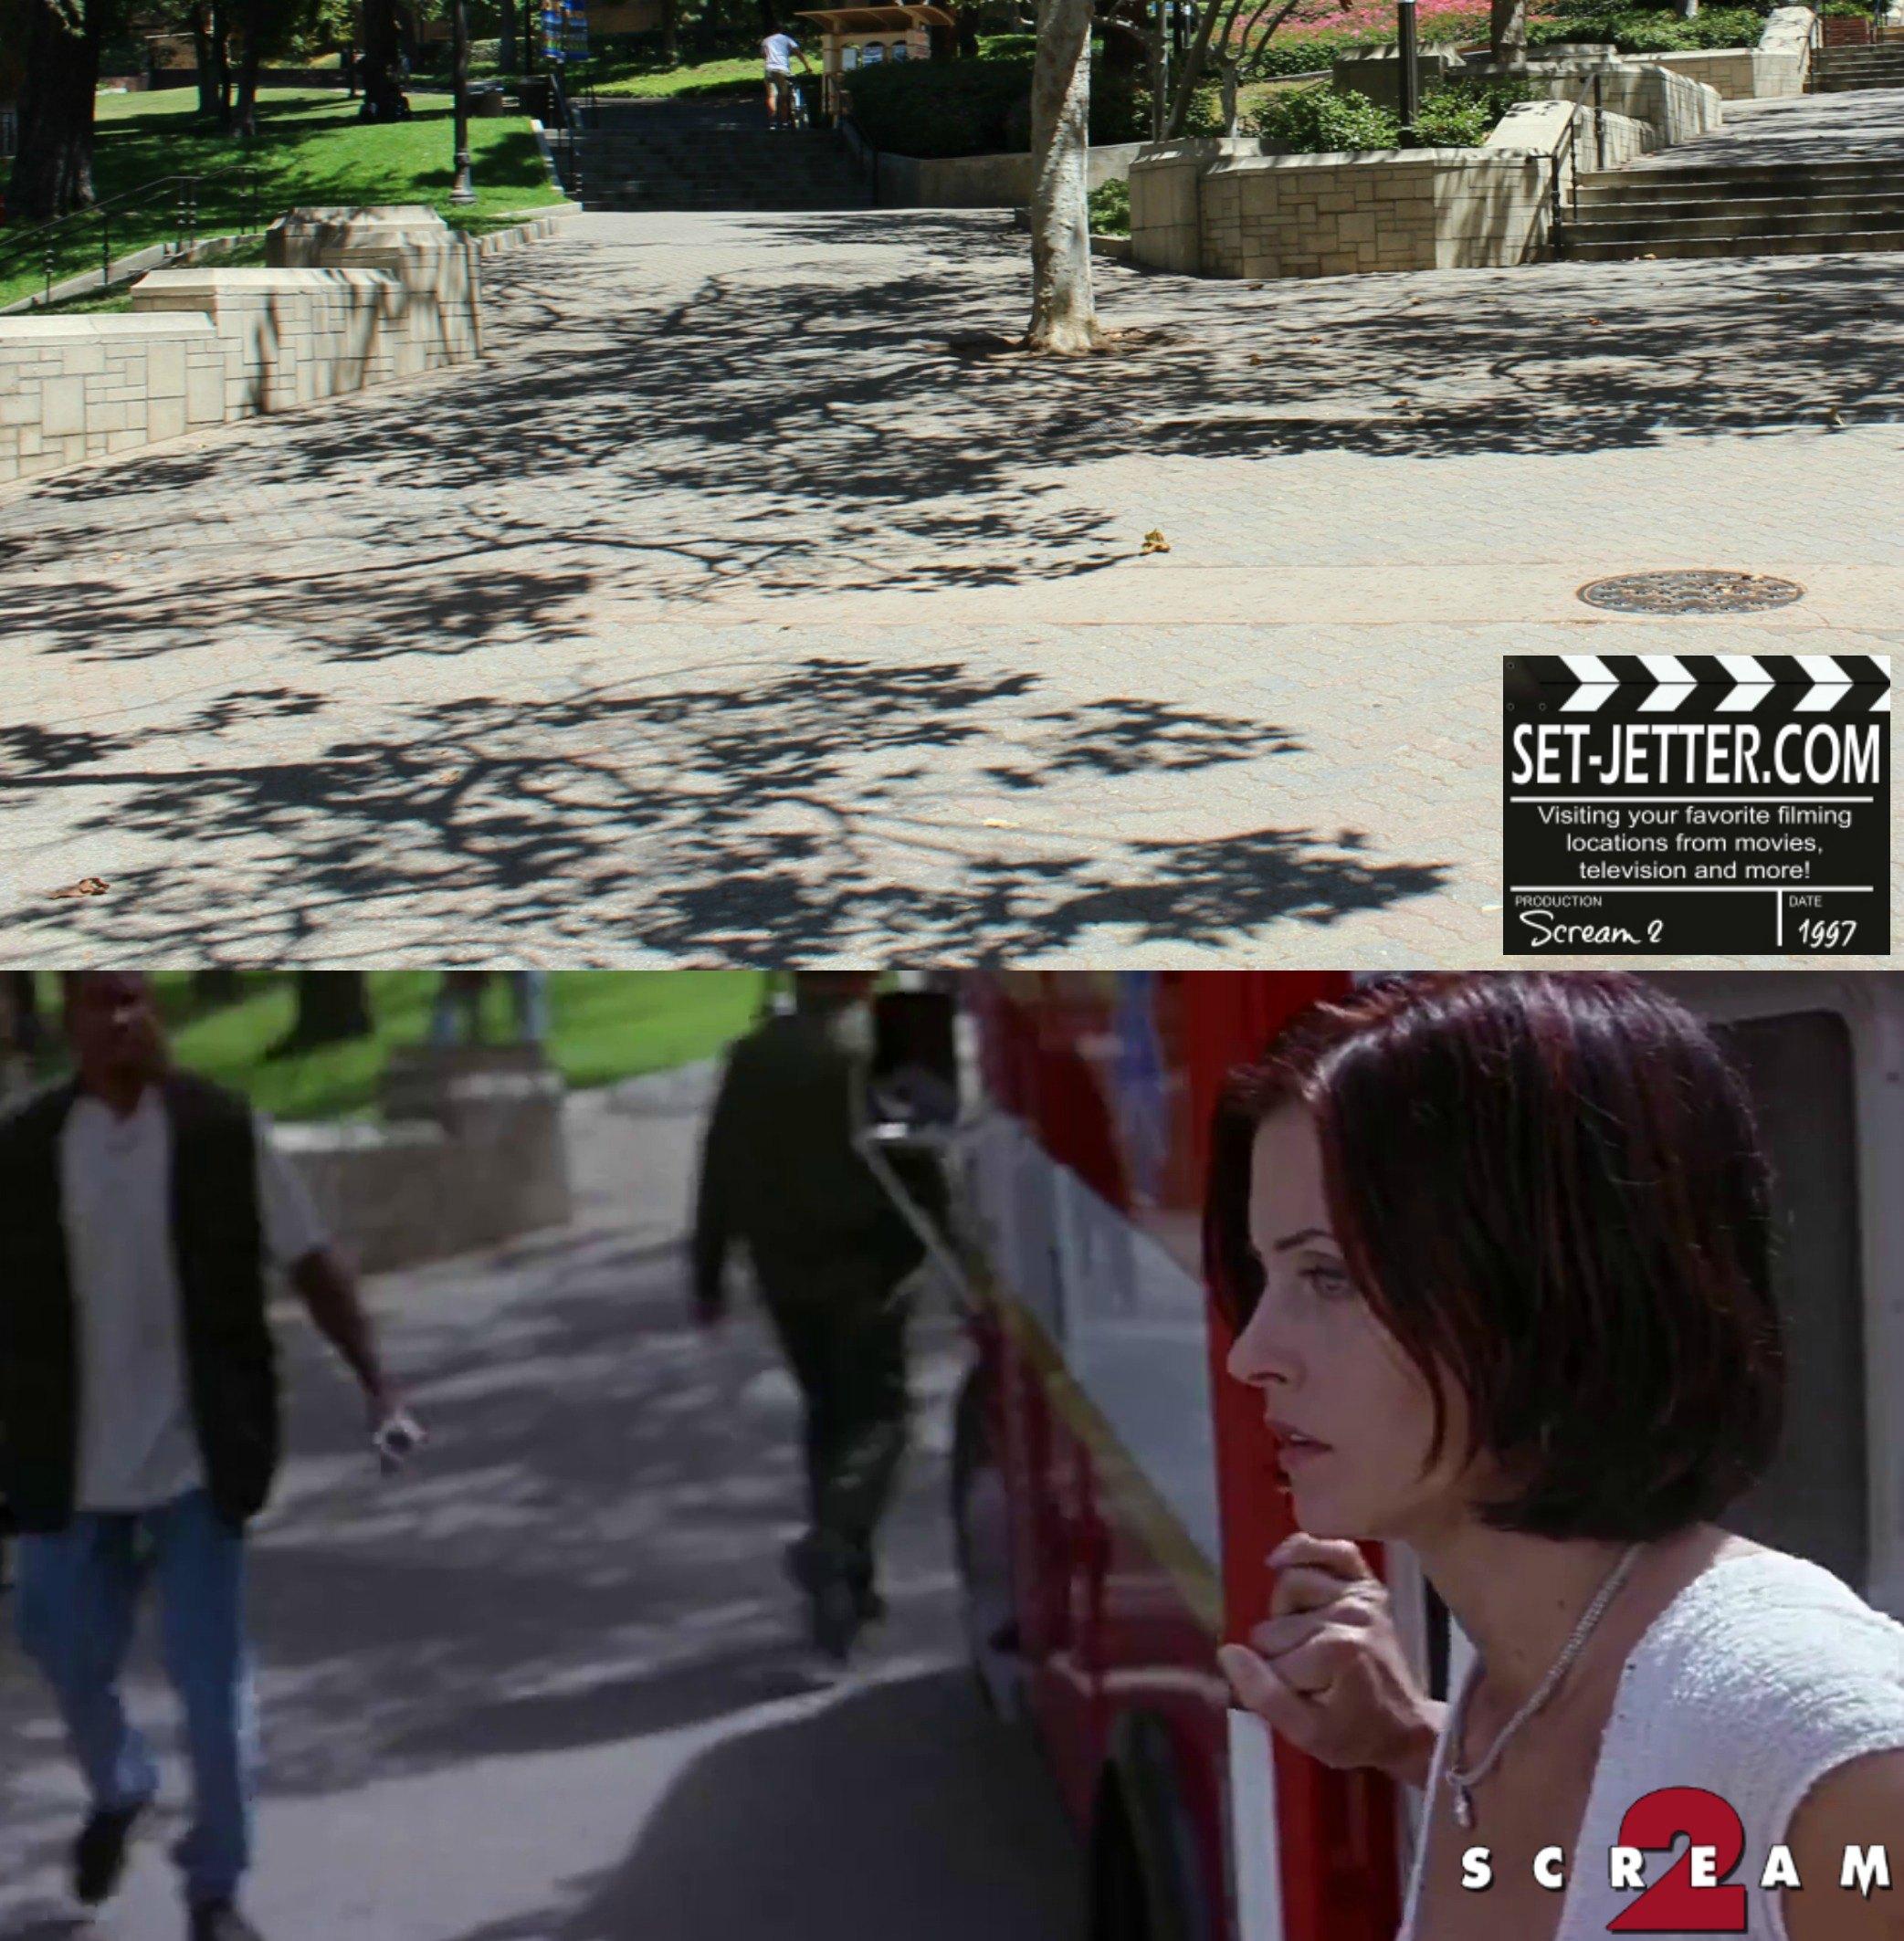 Scream 2 comparison 267.jpg